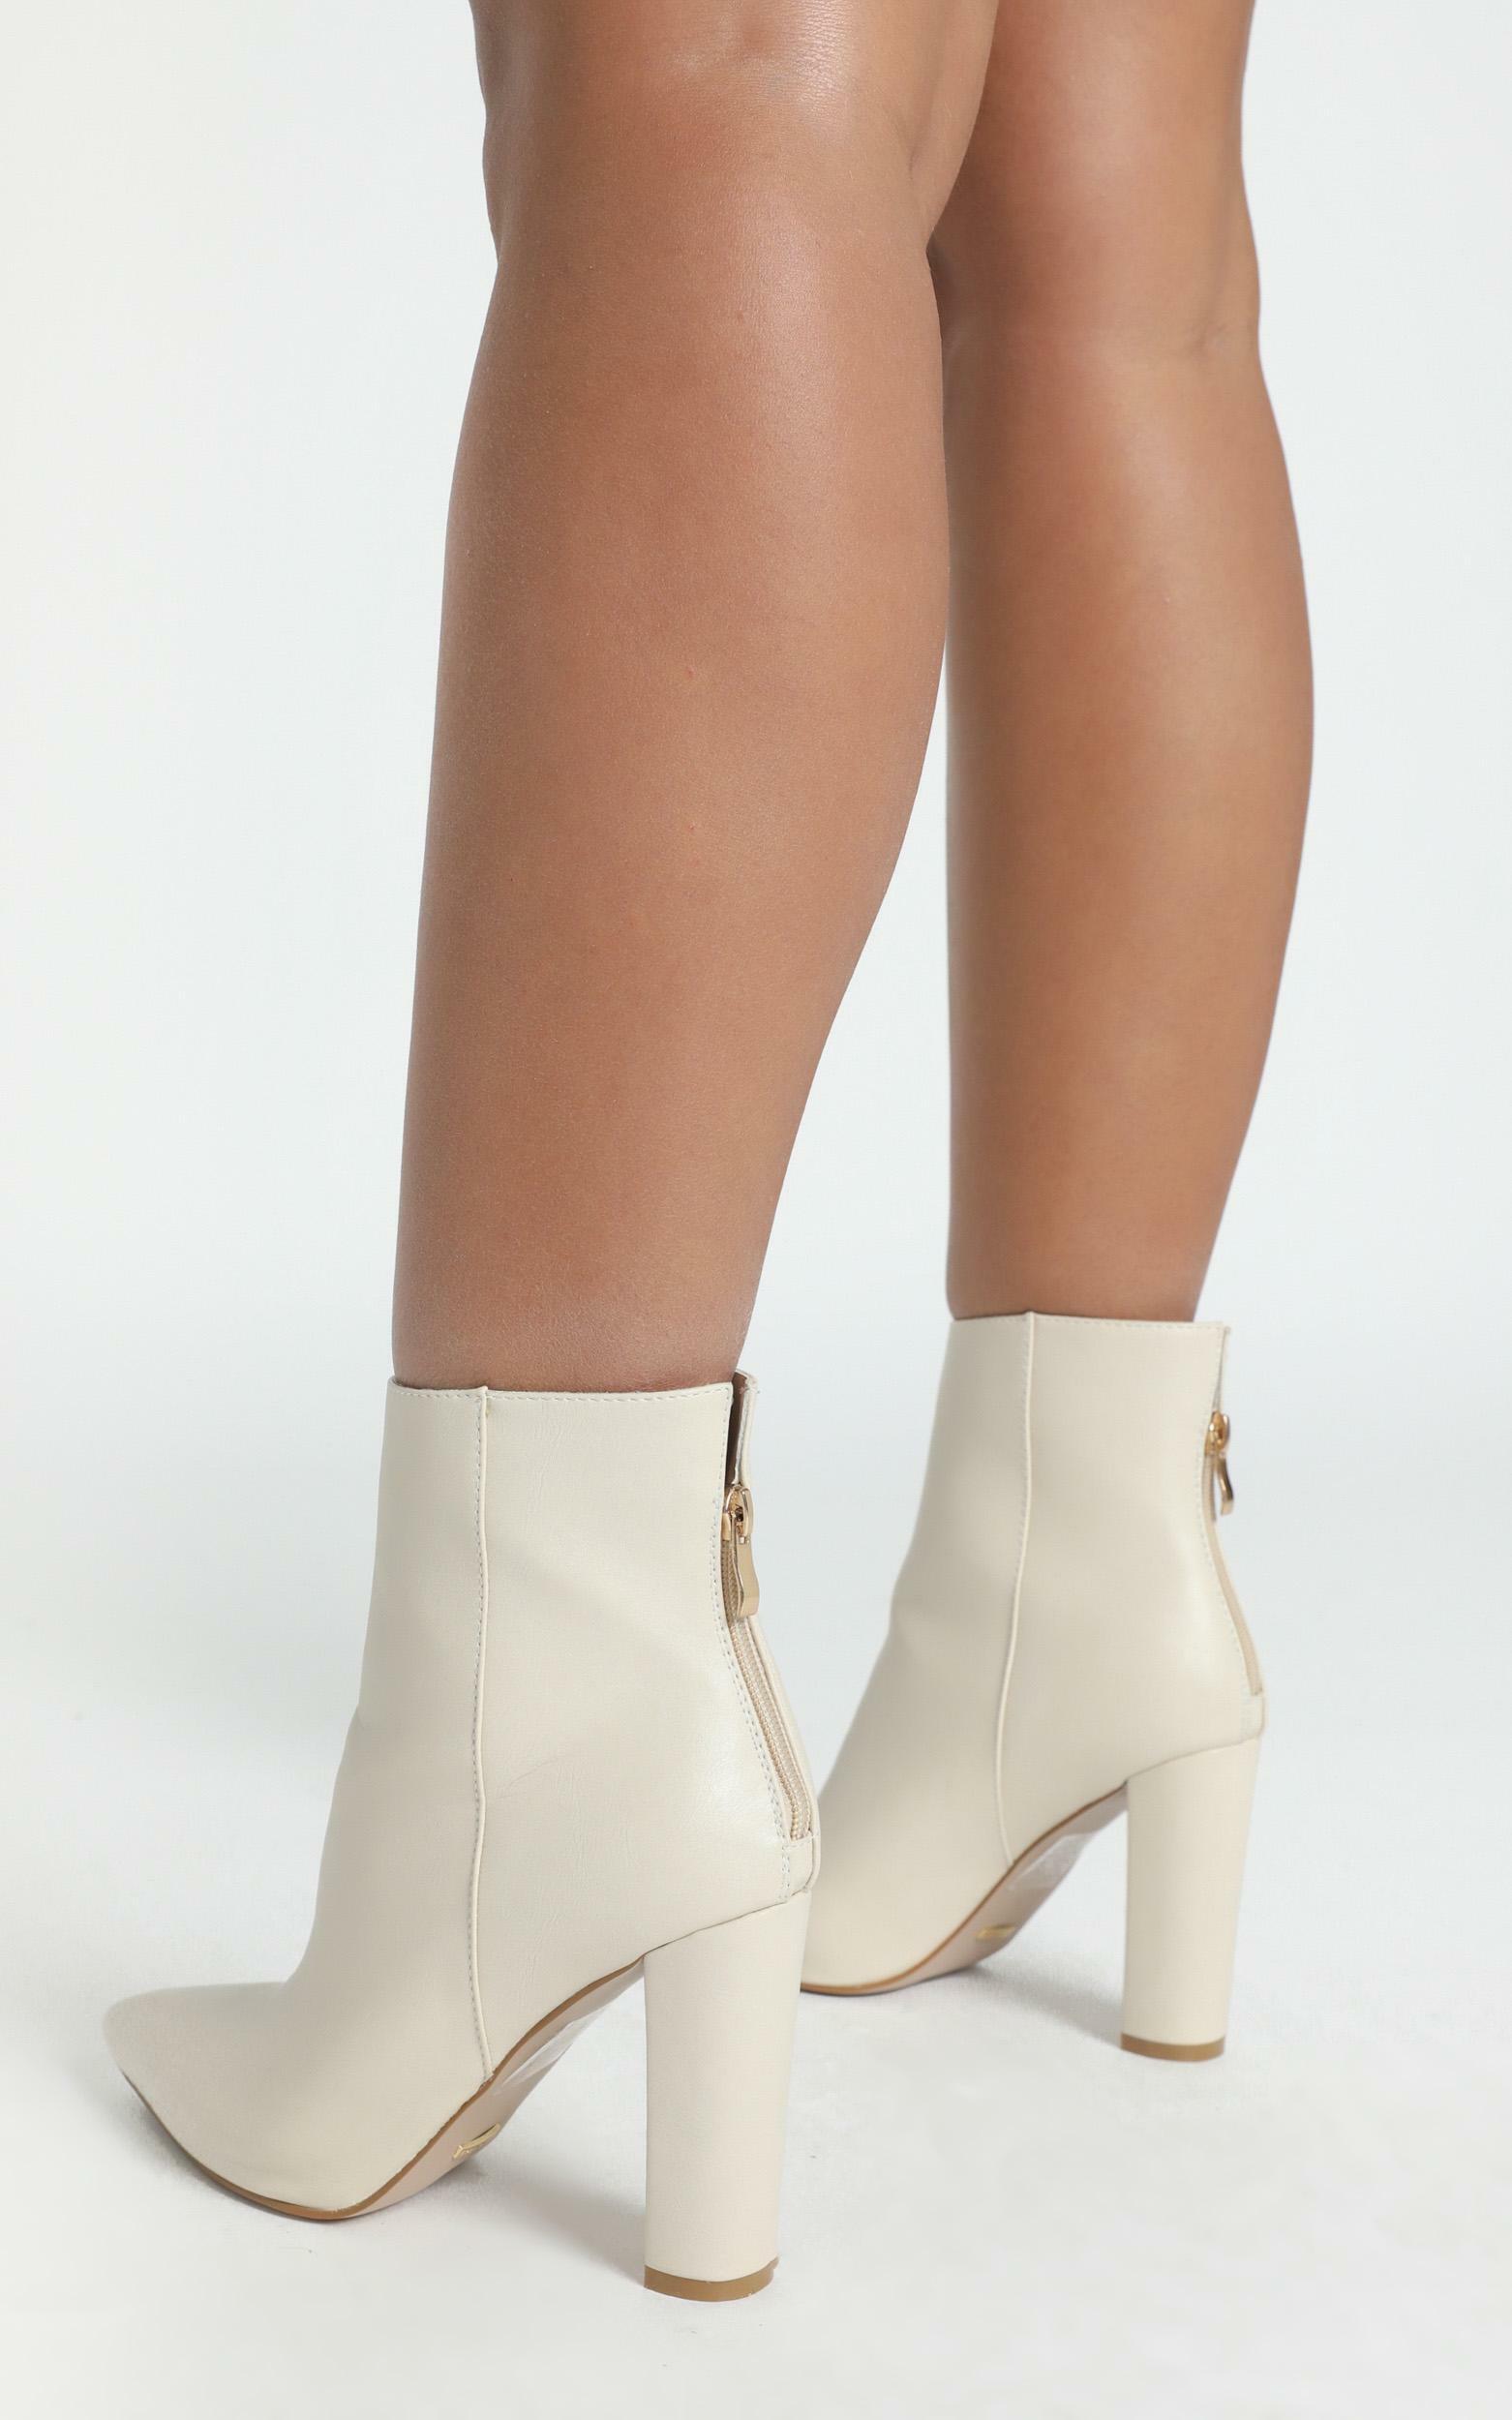 Billini - Kaden Boots in milk - 5, Cream, hi-res image number null